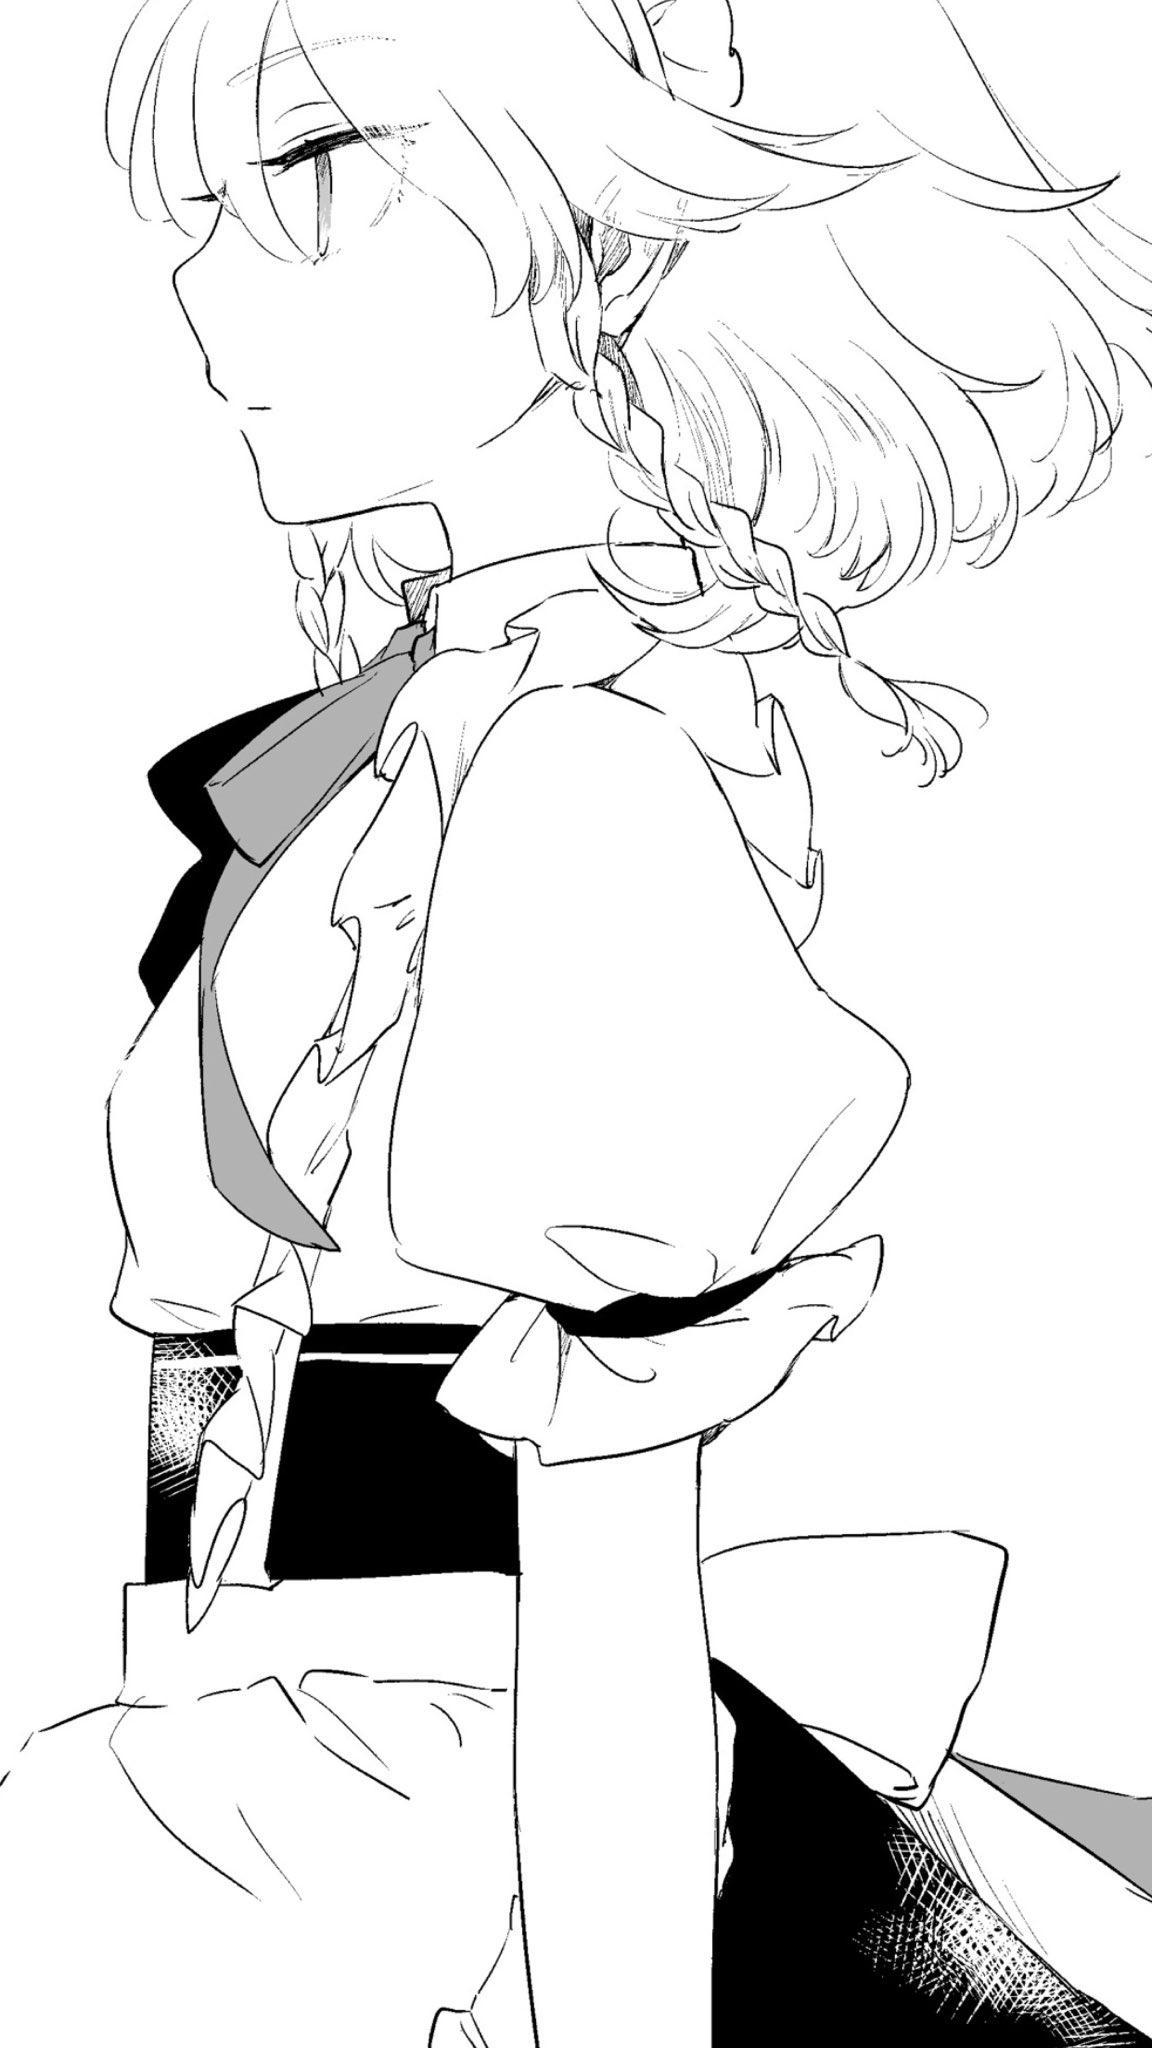 Meiling ni Kawaigarareru Sakuya-san ga Mitai Hon   想看被美鈴寵愛的咲夜小姐的同人本 34